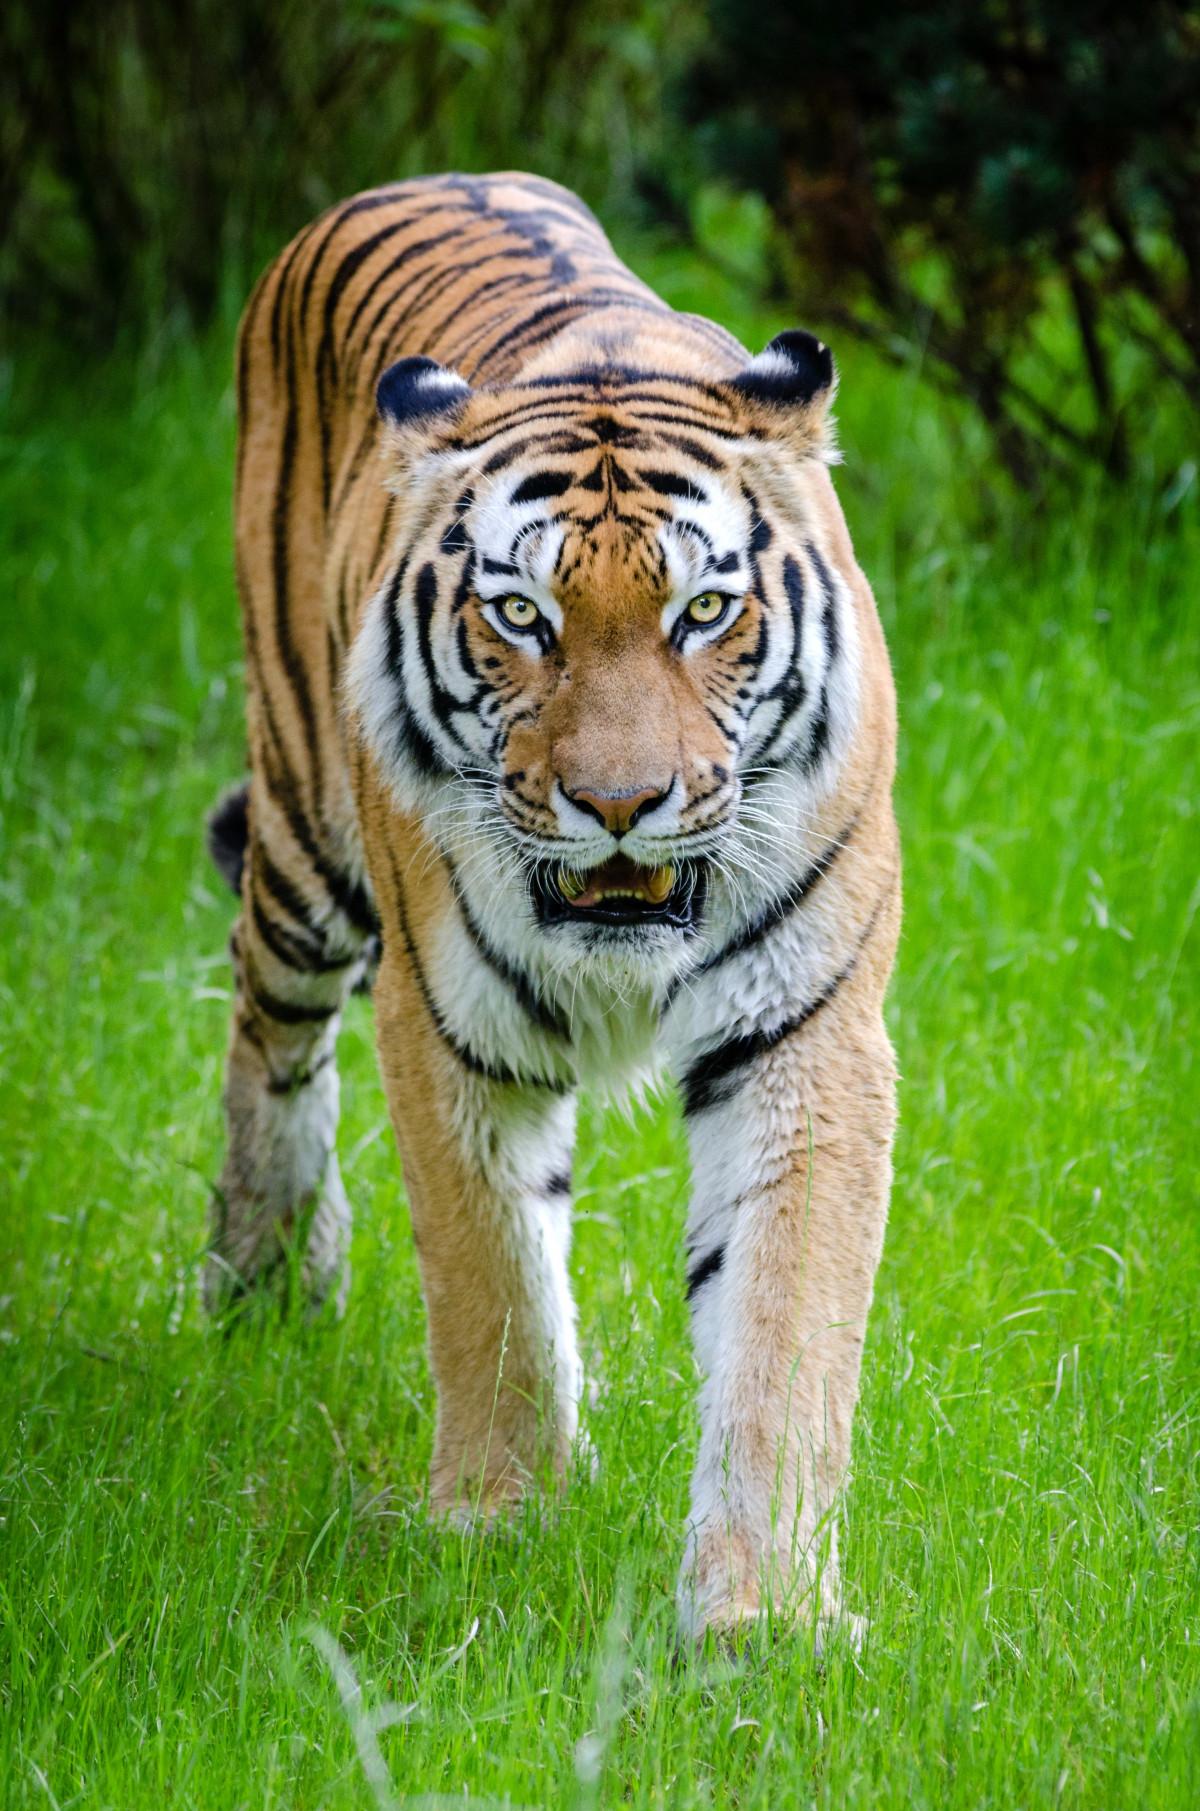 Gambar  putih hewan margasatwa kebun binatang bulu